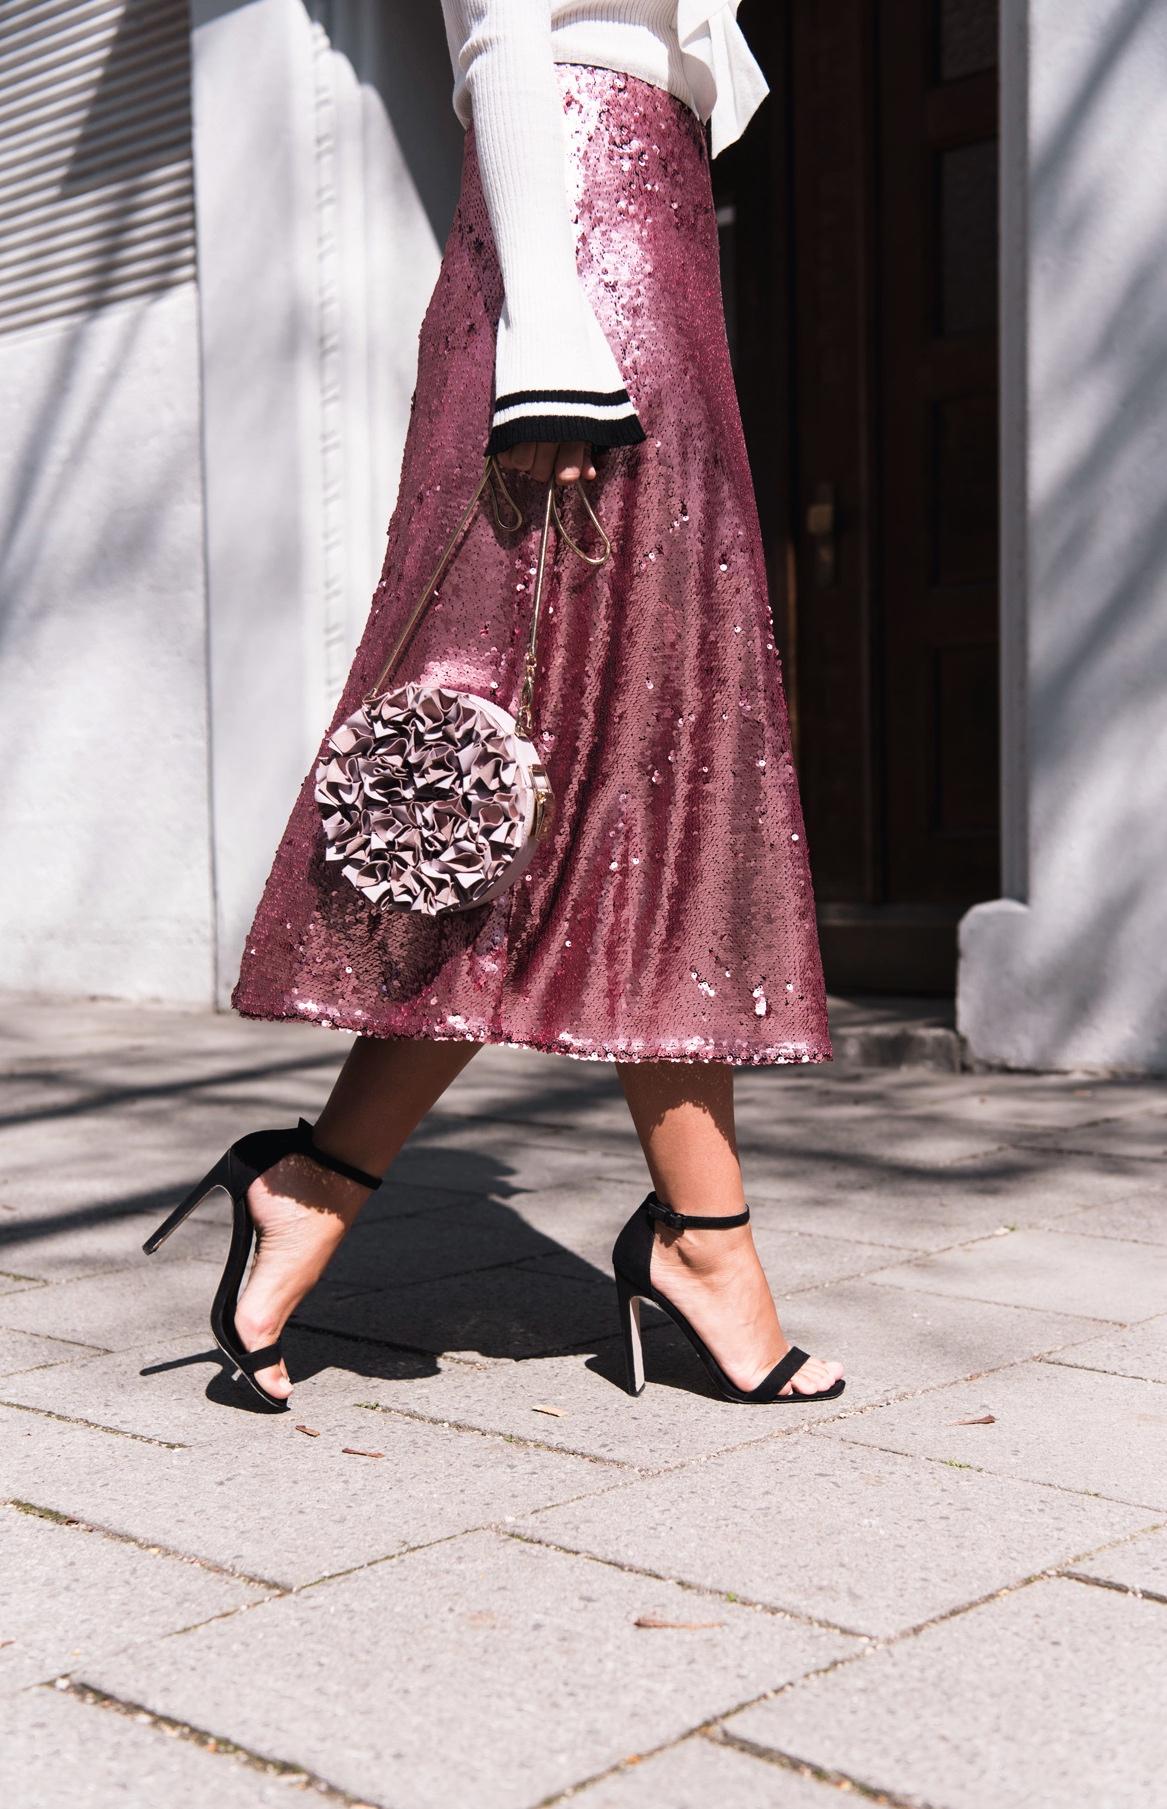 pailletten-rock-rosa-pink-aigner-TONDA-FIROE-EVENING-BAG-XS-zara-pommel-sandalen-fashiioncarpet